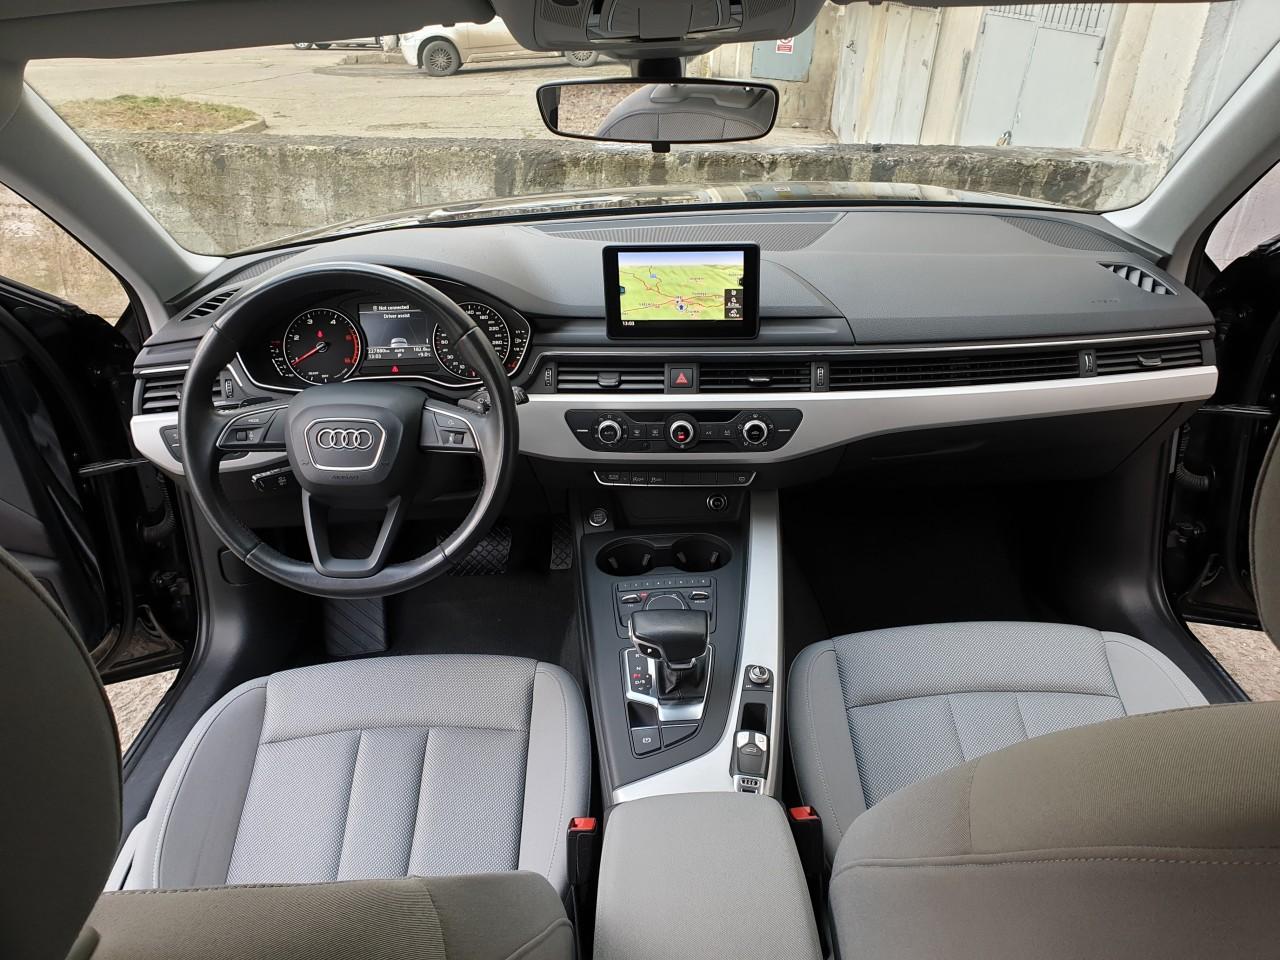 Audi A4 New model !!! impecabil / 2016 / 2.0 TDI /EURO 6 fab. 2016